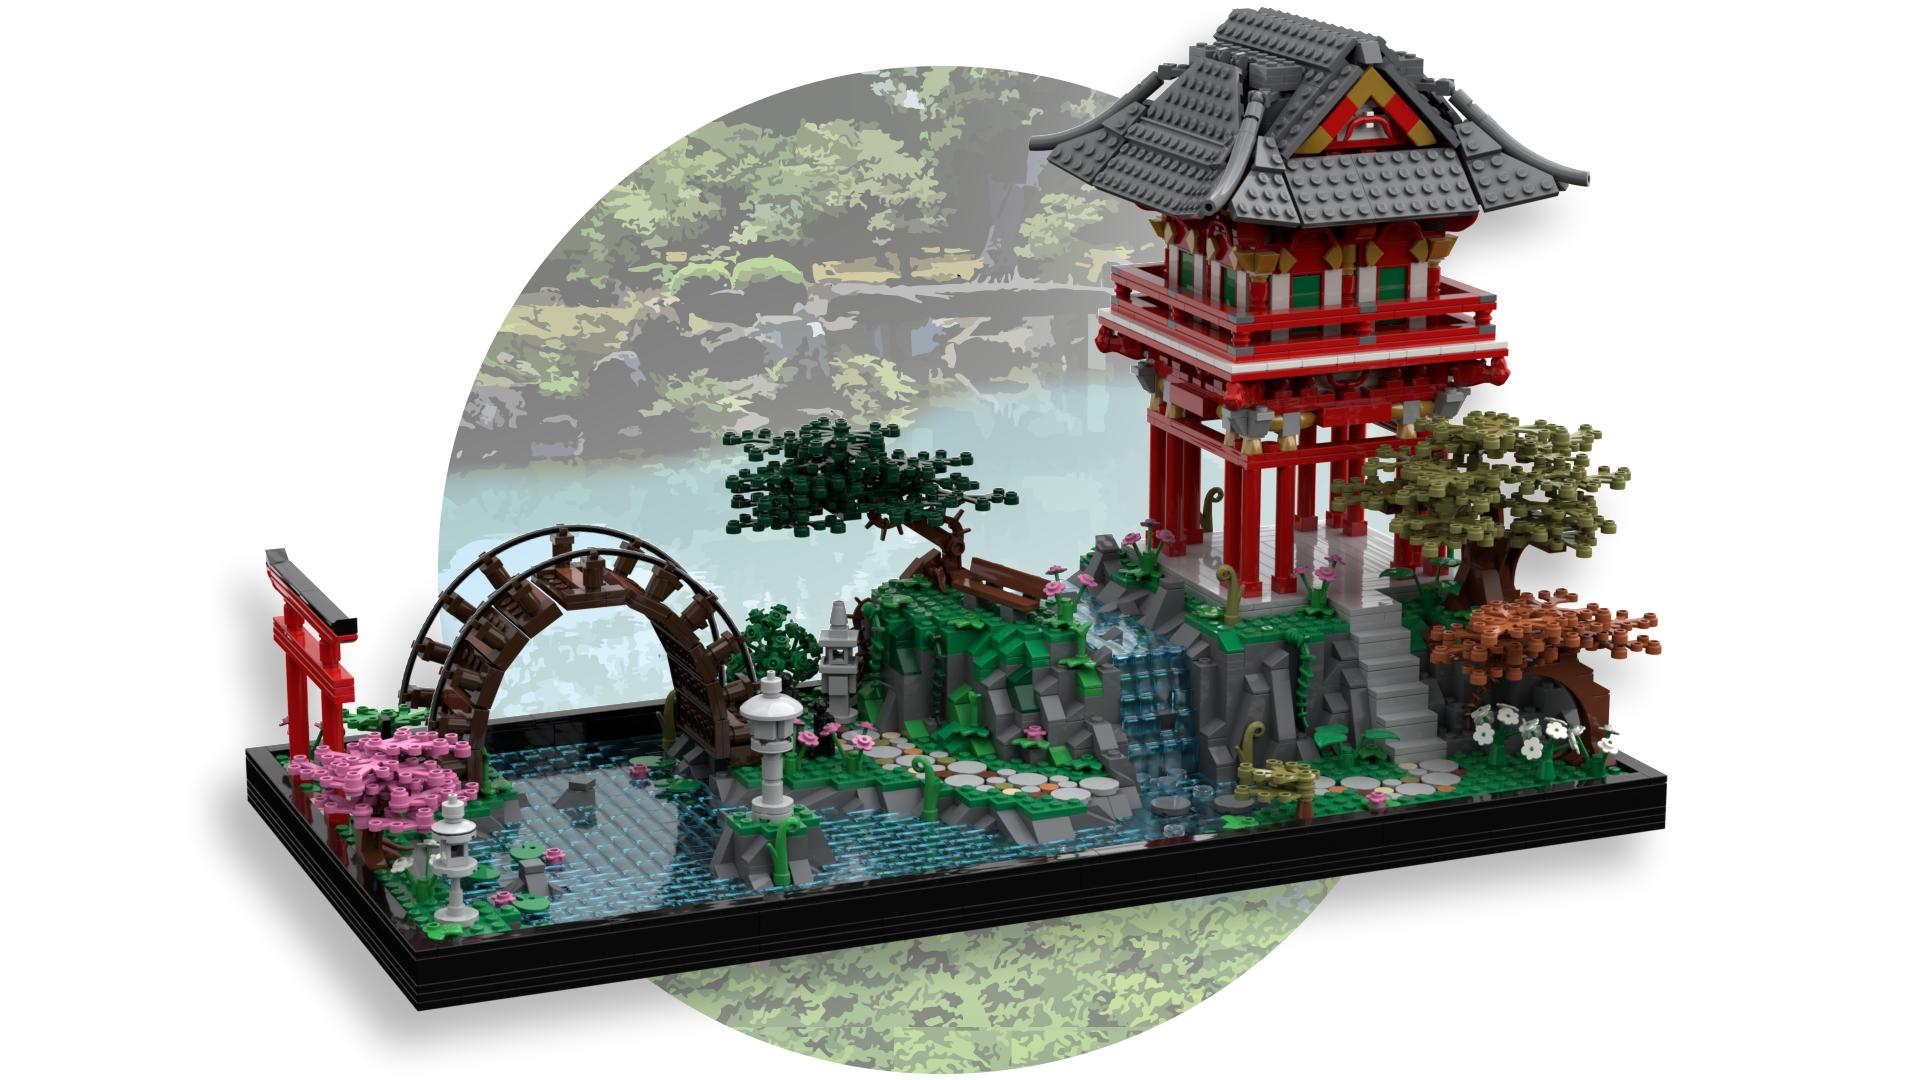 Lego Ideas Japanese Tea Garden Achieves 10 000 Supporters